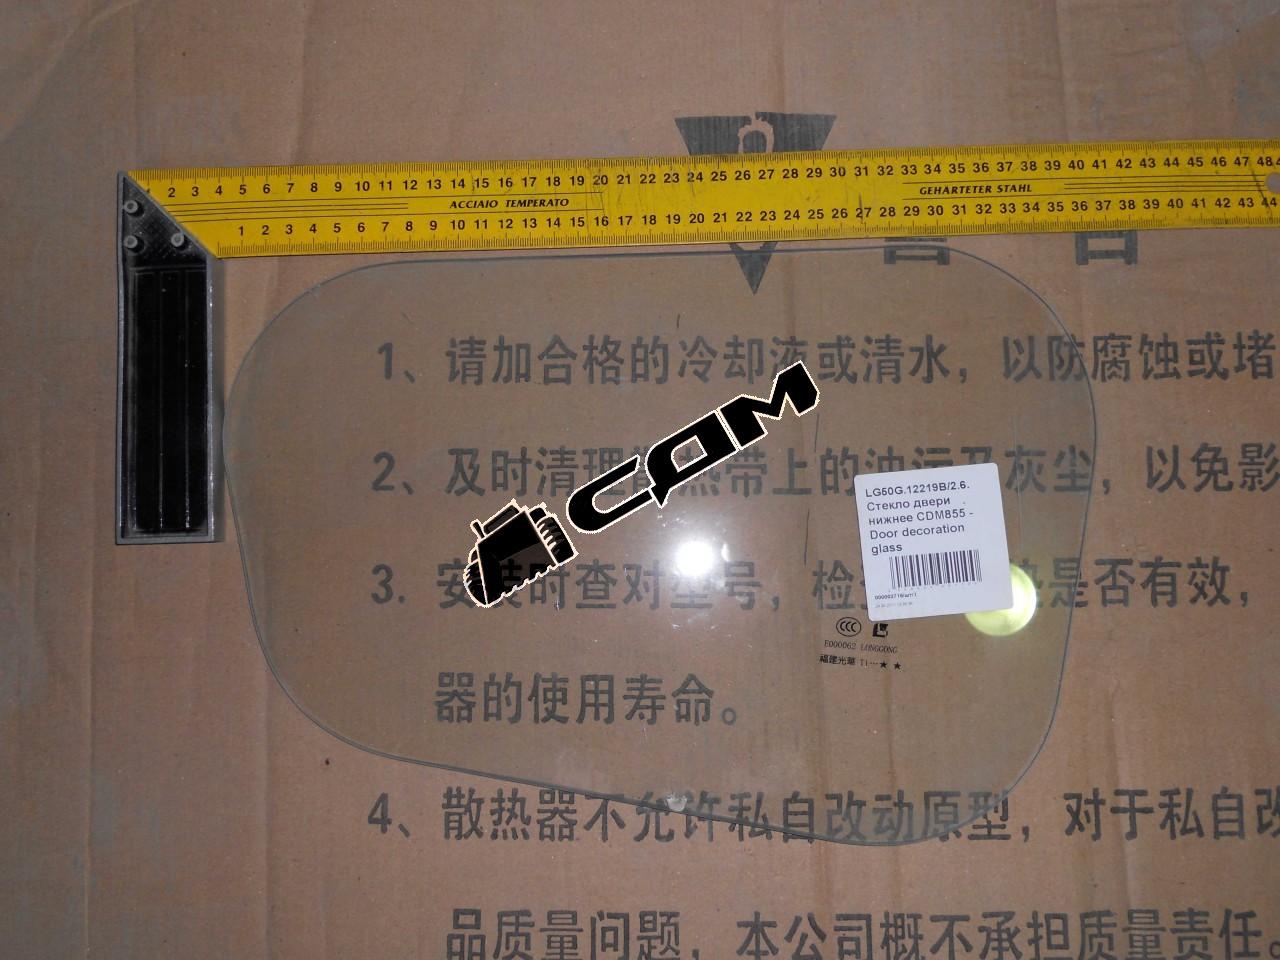 Стекло двери нижнее CDM855 (до 2011г) LG50G.12219B